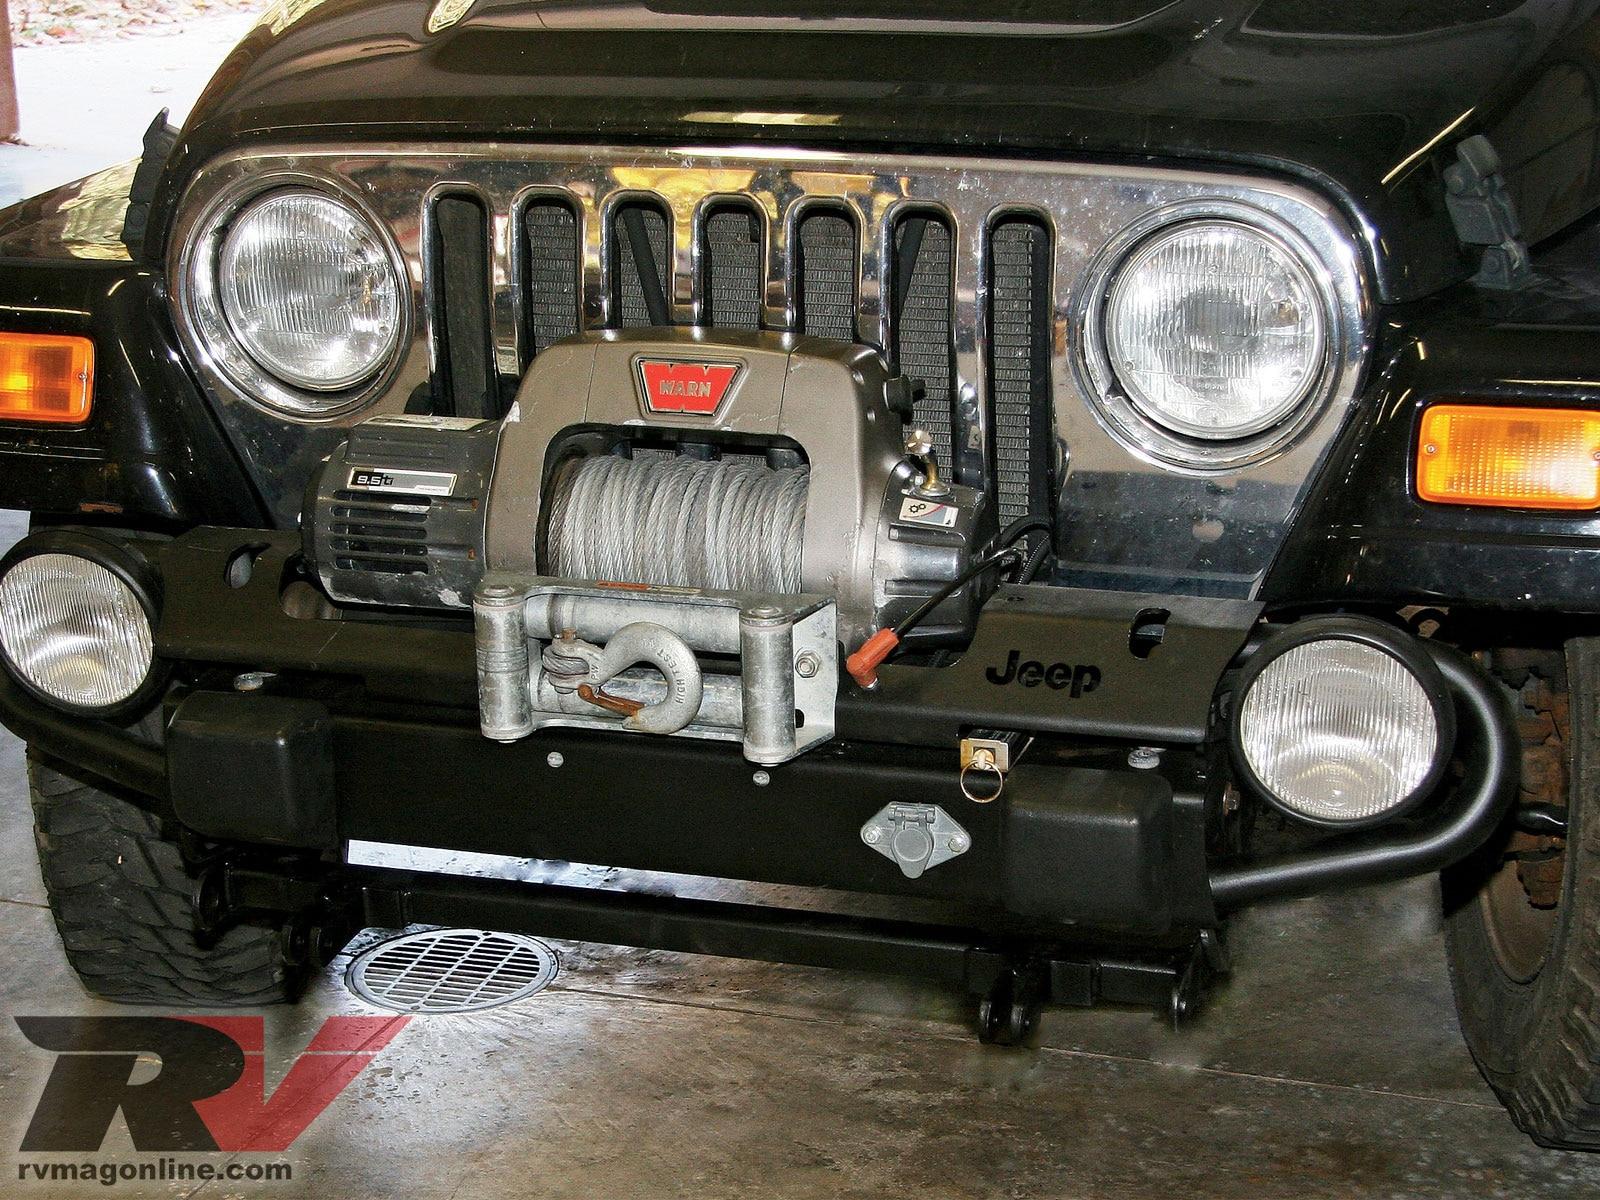 Jeep Jk Flat Tow Wiring Harness from assets.trucktrend.com